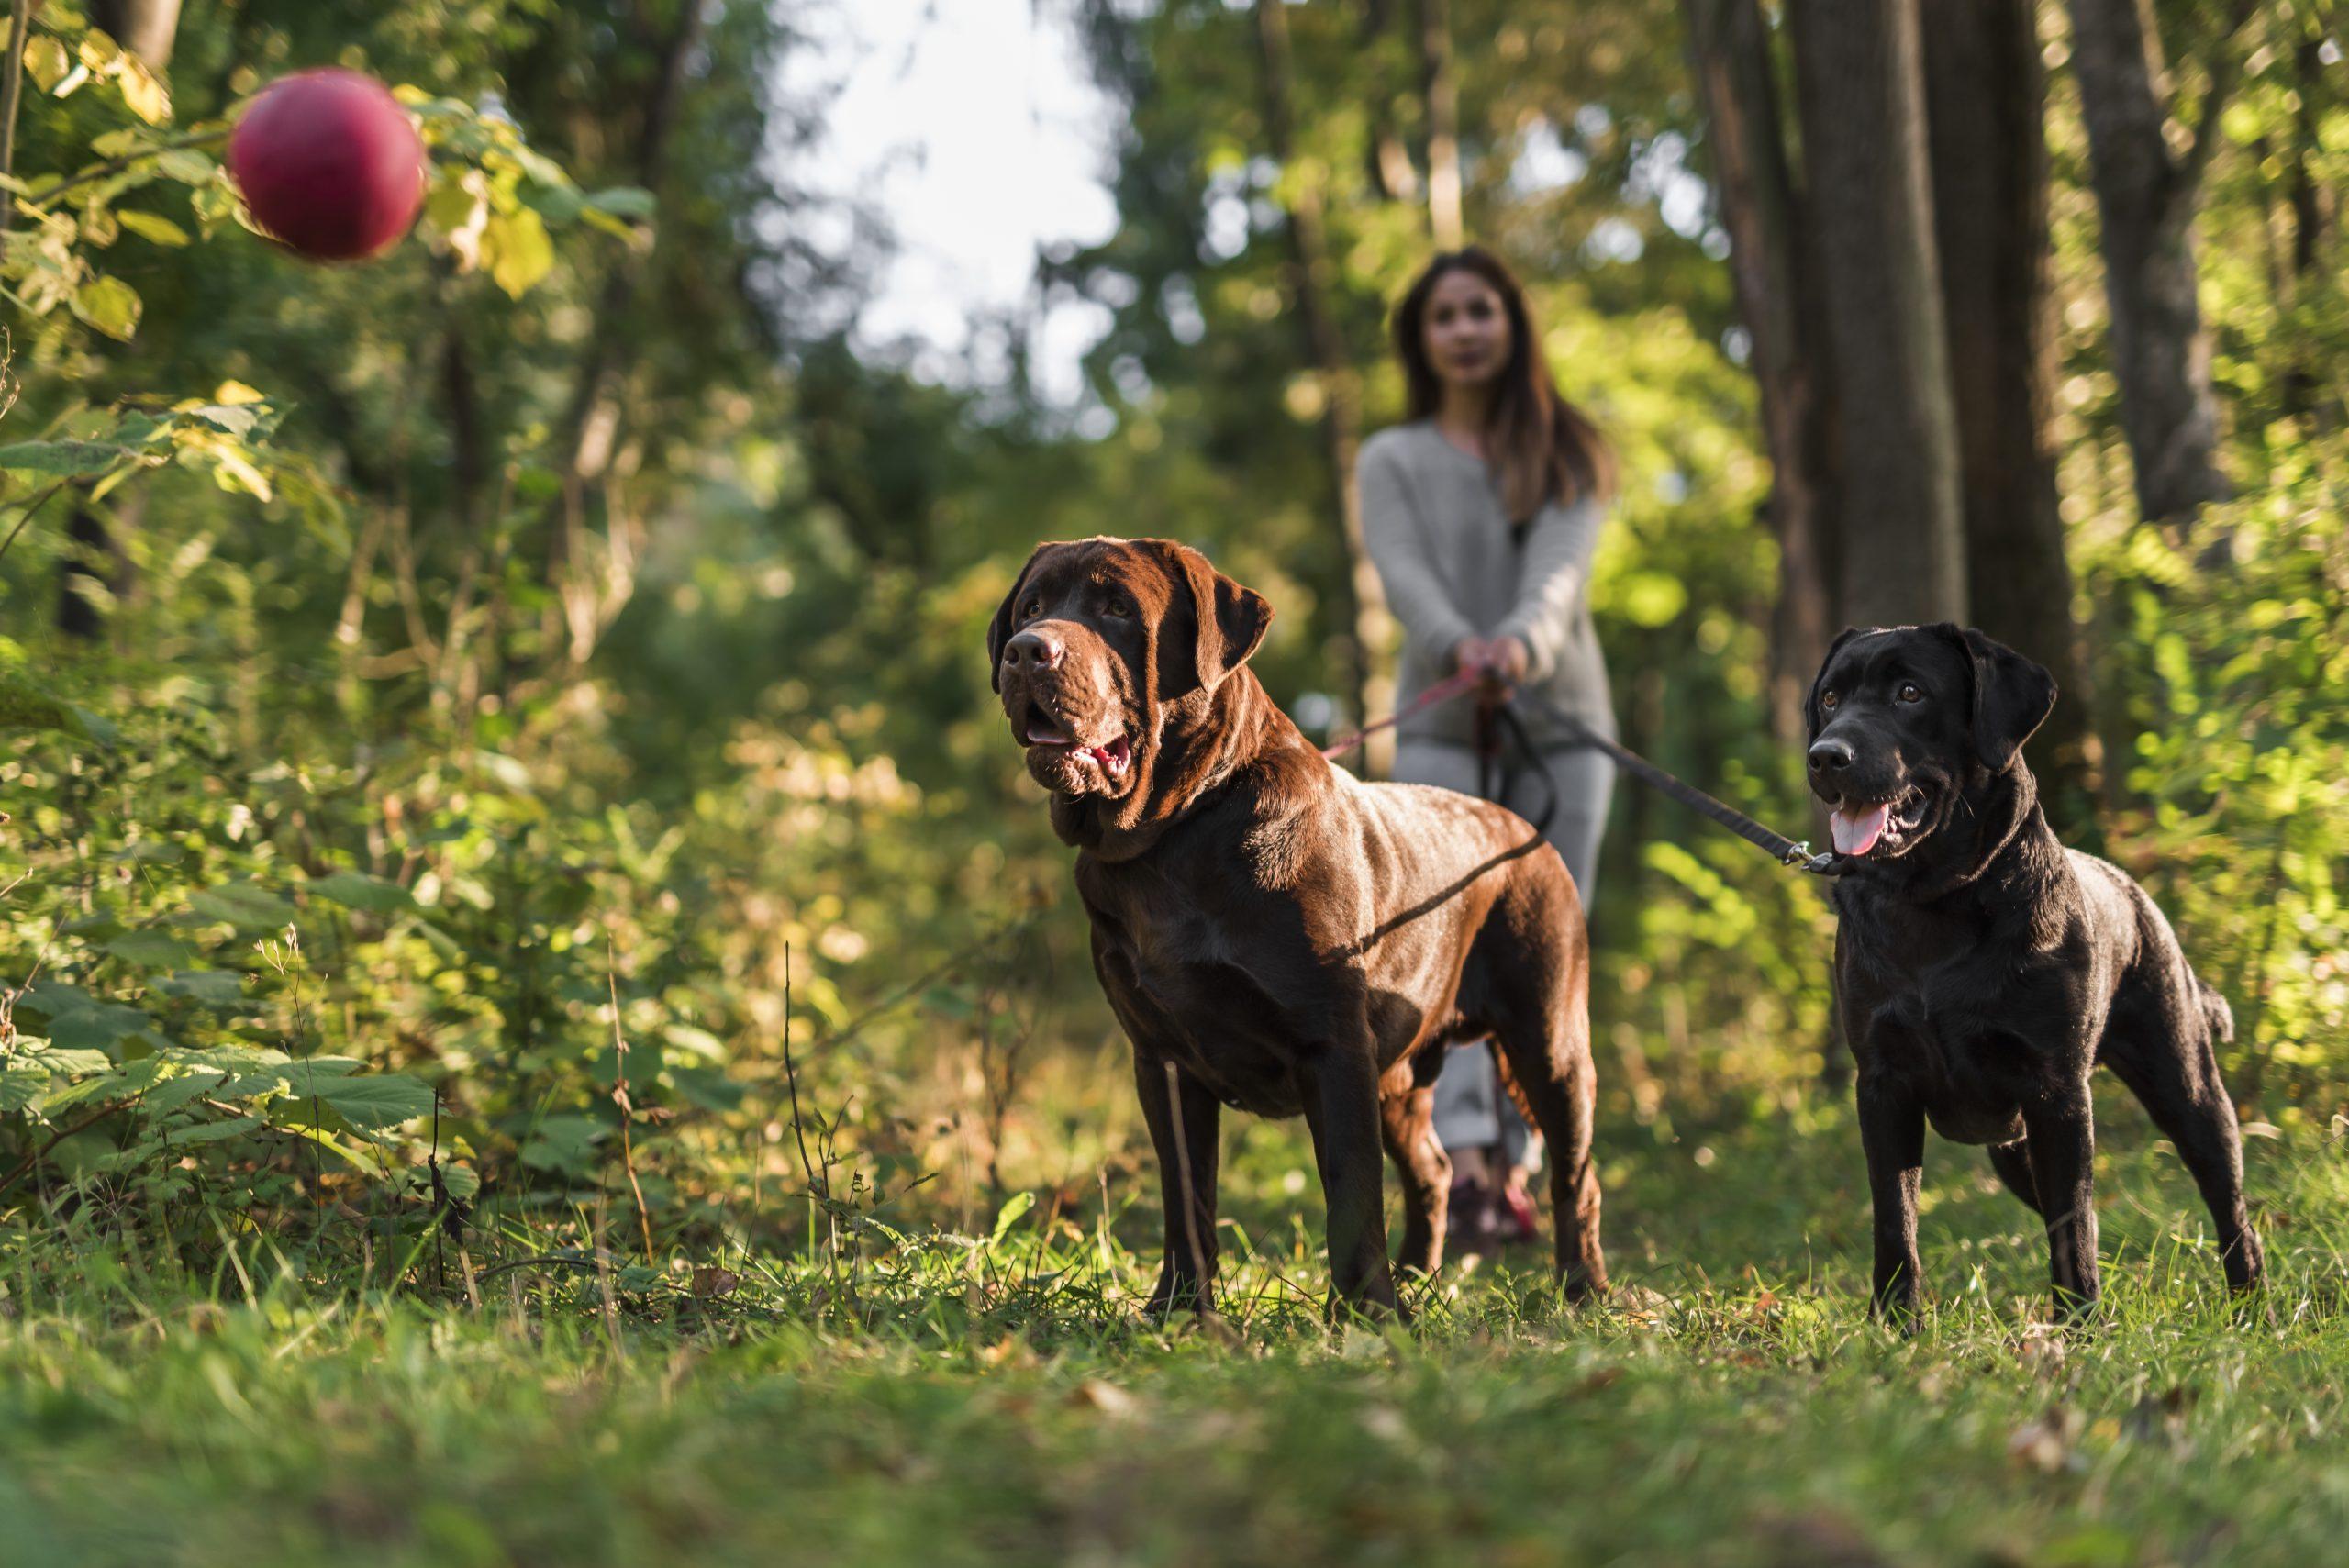 Perros paseando con collar